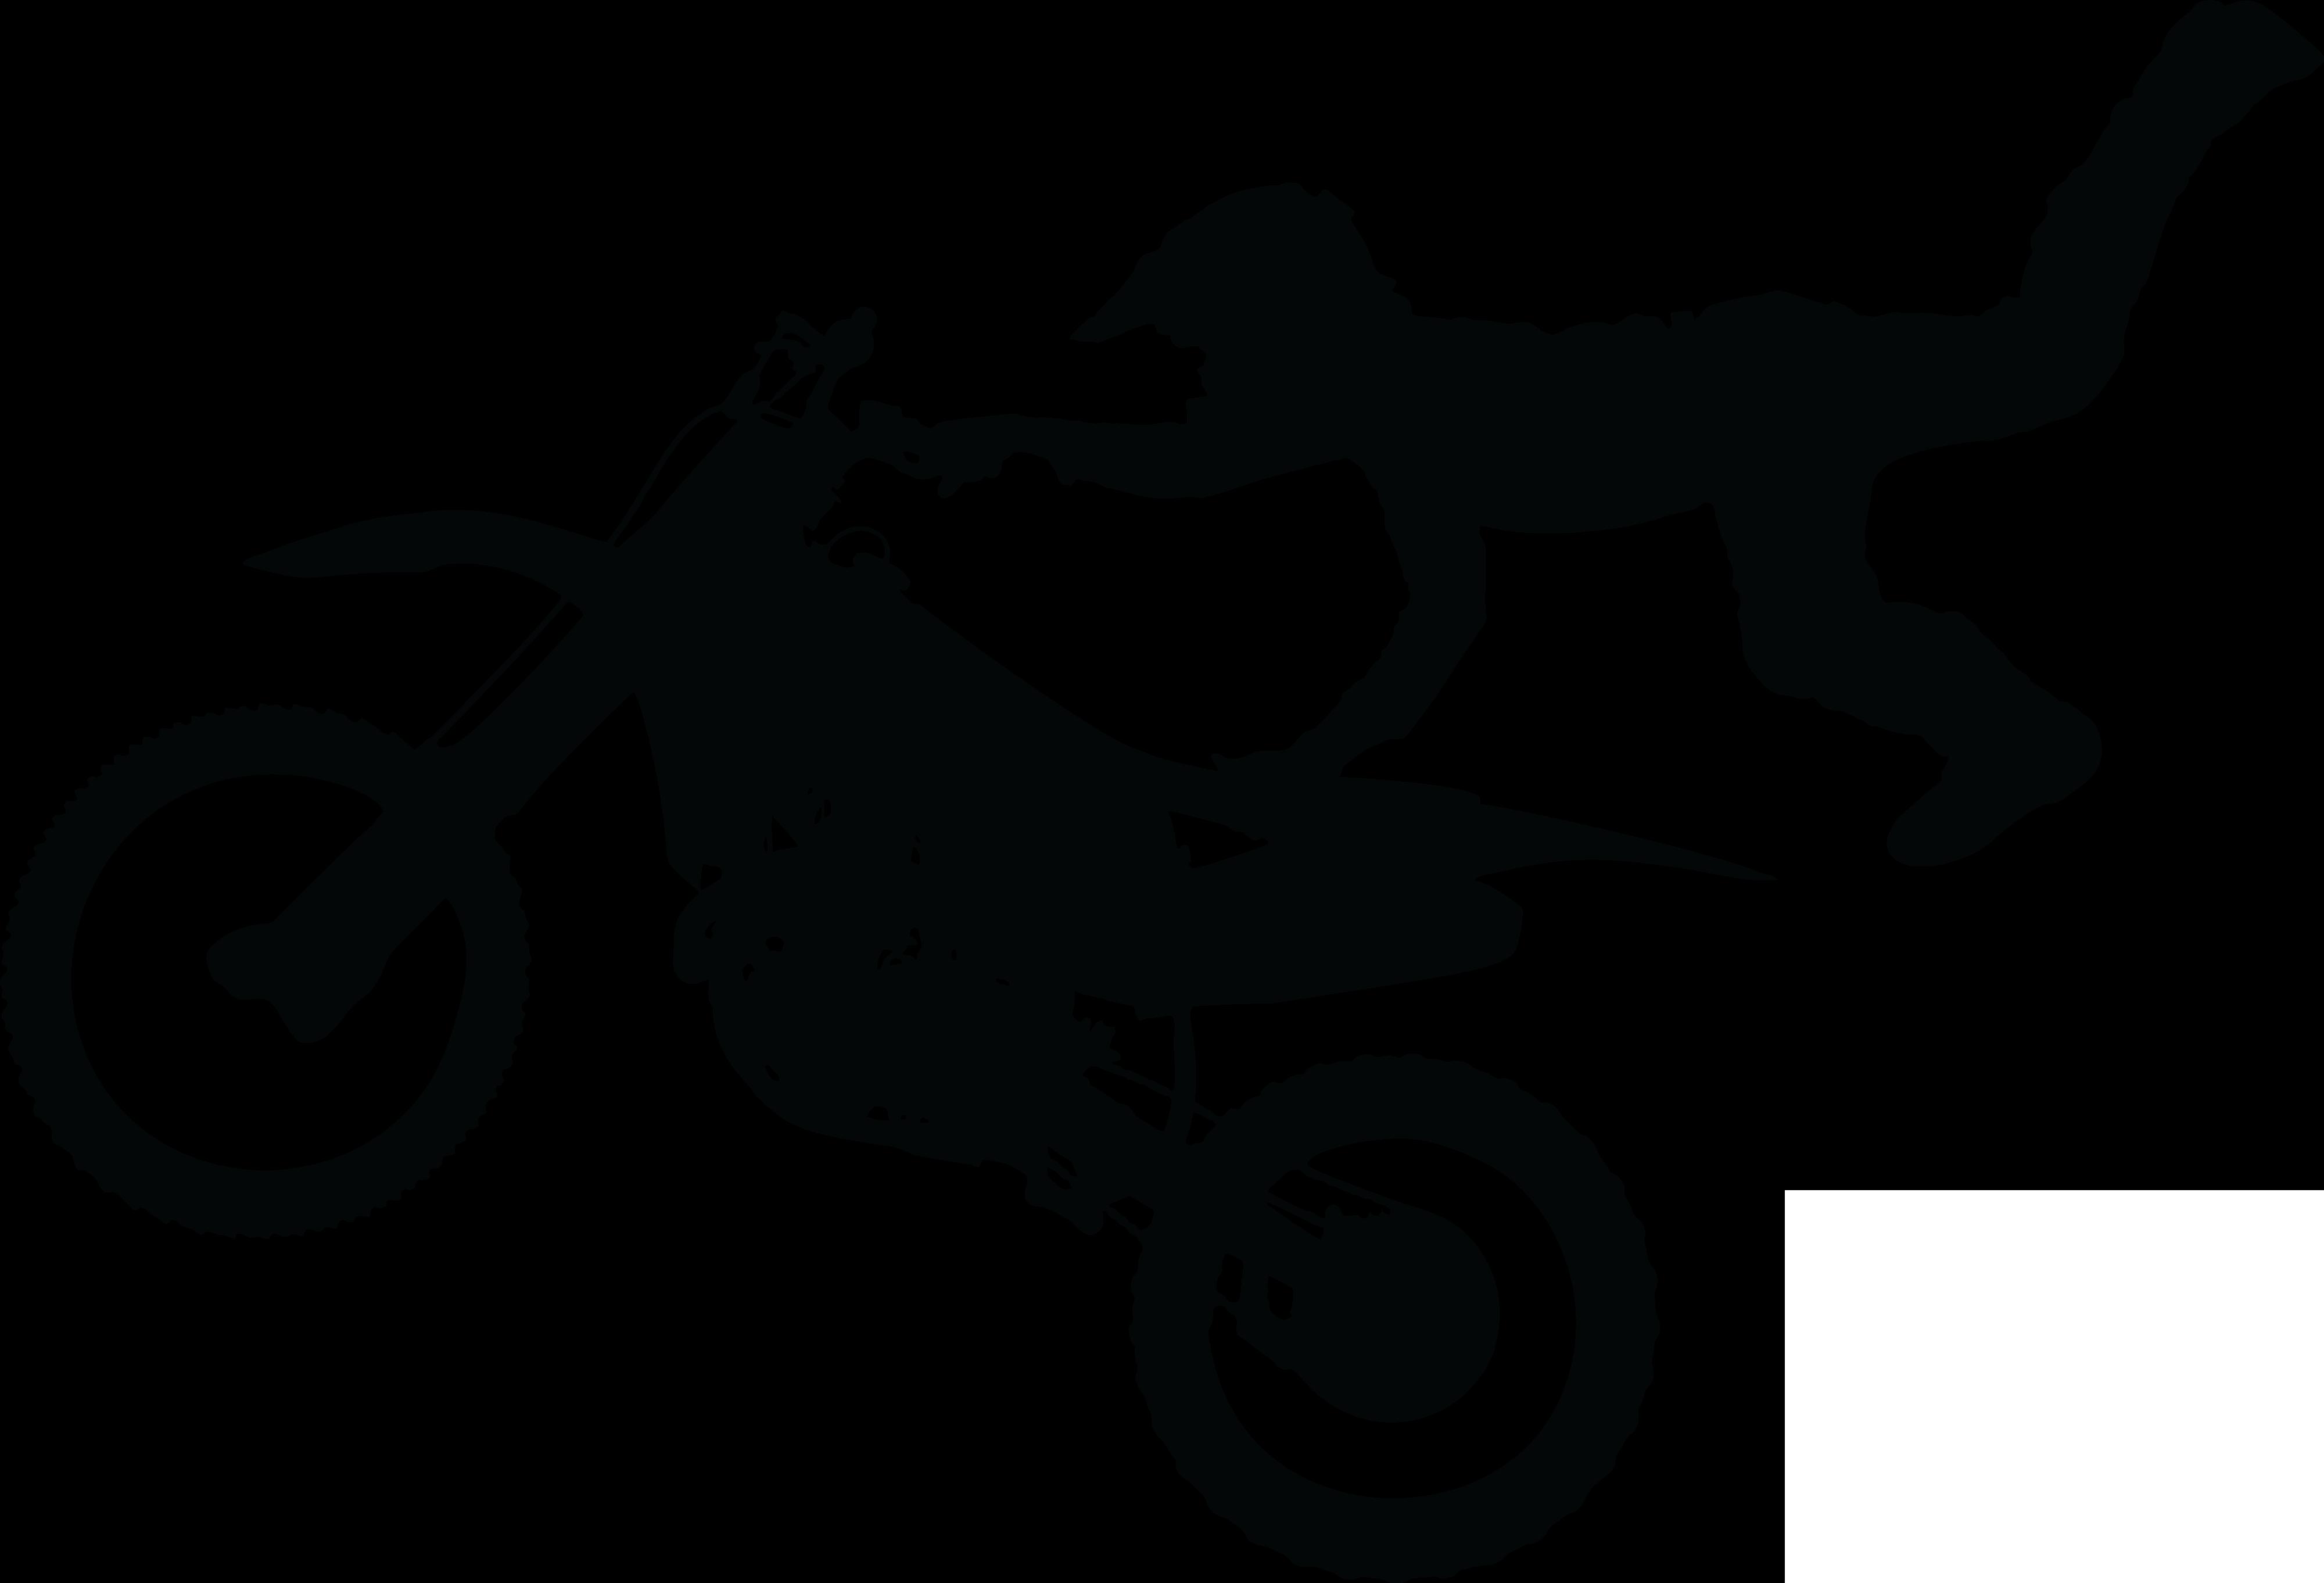 clip art royalty free library Dirt Bike PNG Free Transparent Dirt Bike